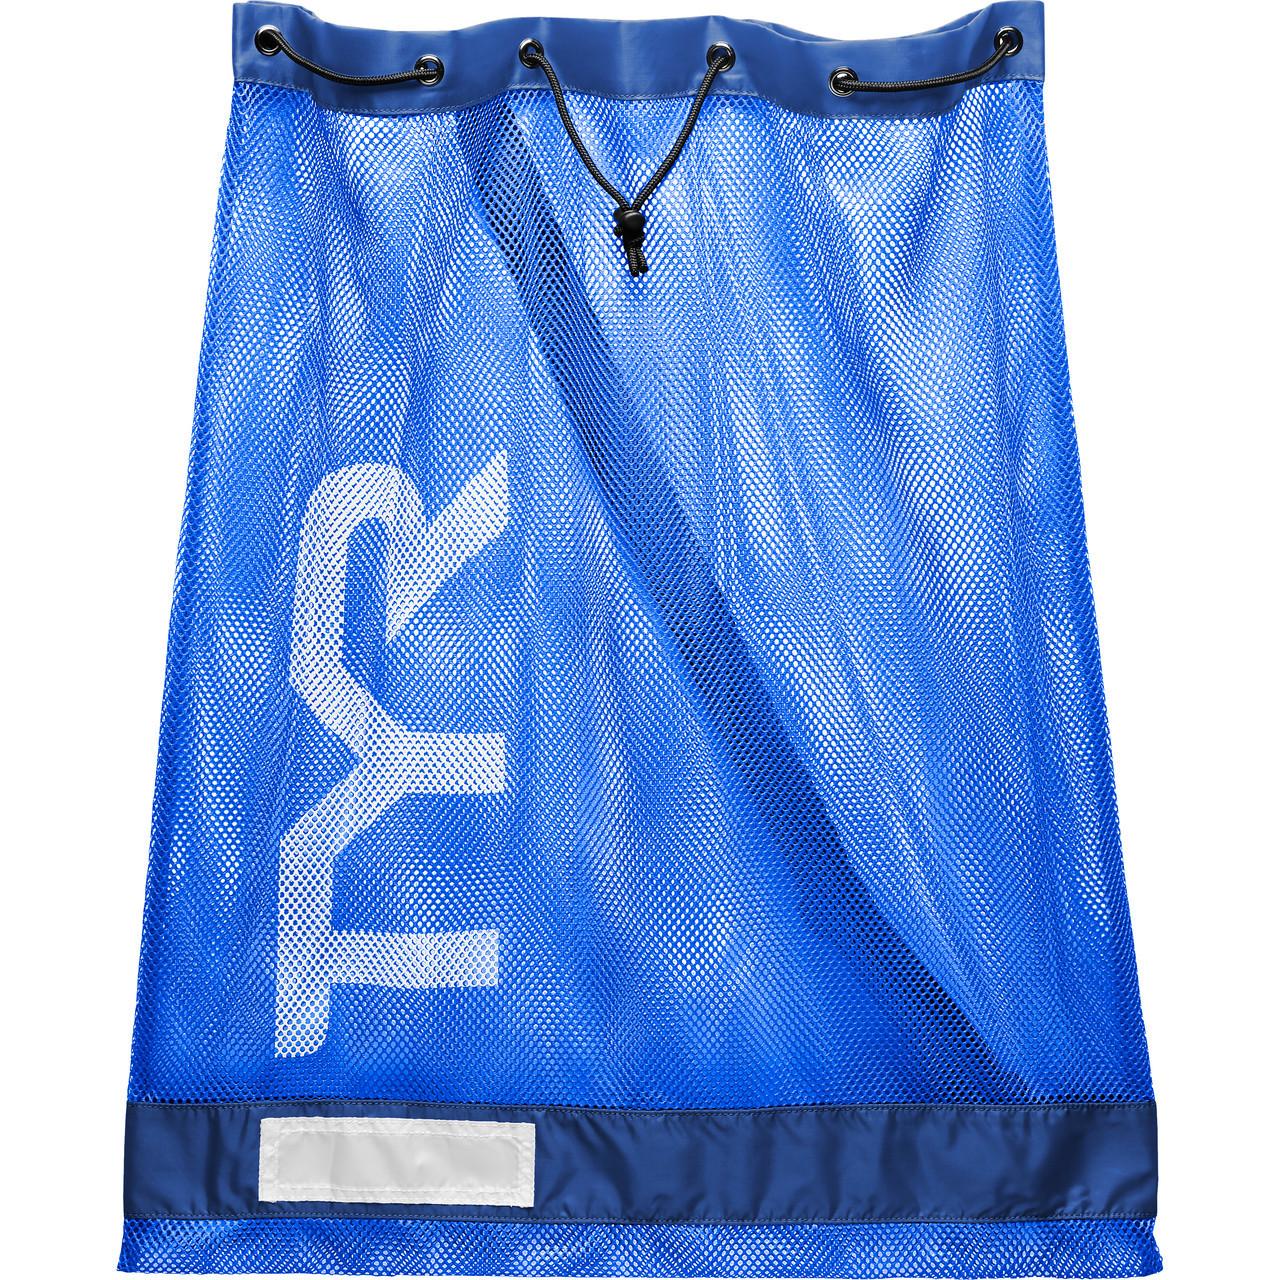 TYR Mesh Equipment Bag - 2019 price